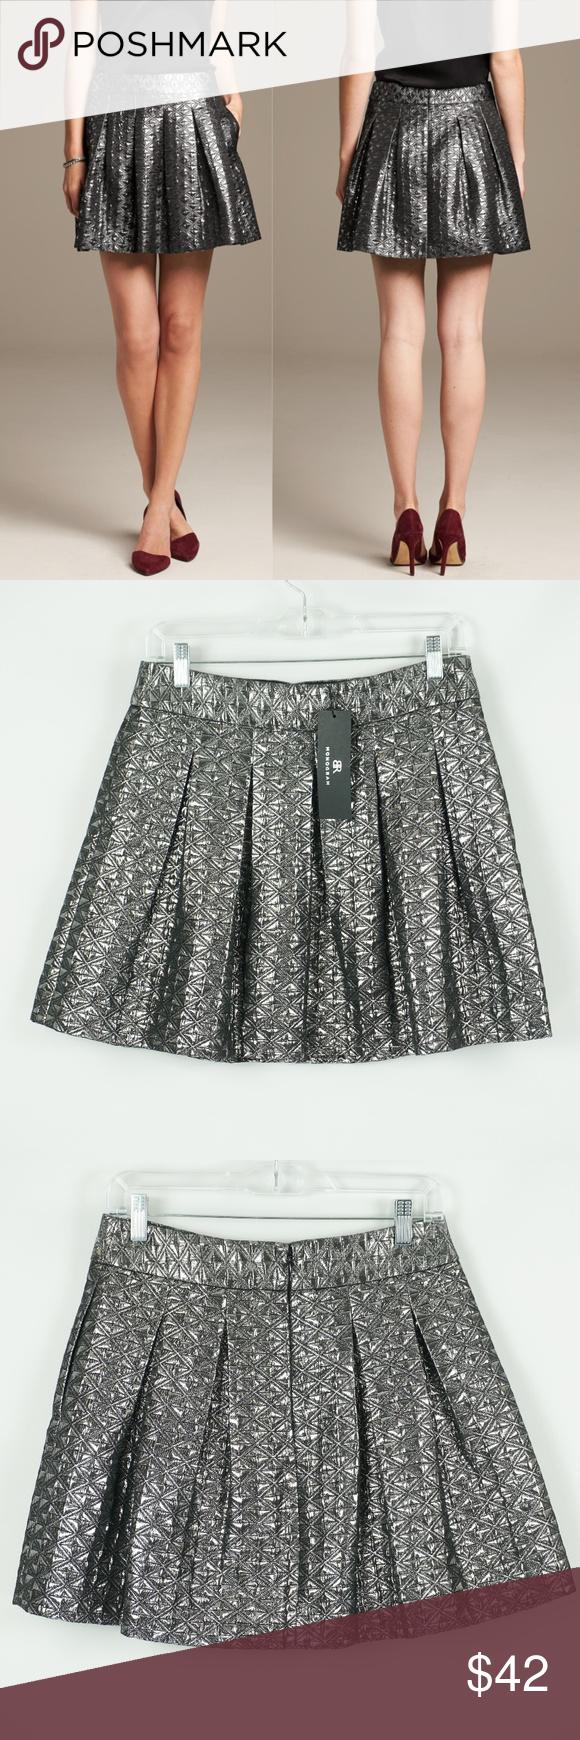 Br Monogram Metallic Shine Box Pleat Skirt Size 6 Nwt Clothes Design Box Pleat Skirt Womens Skirt